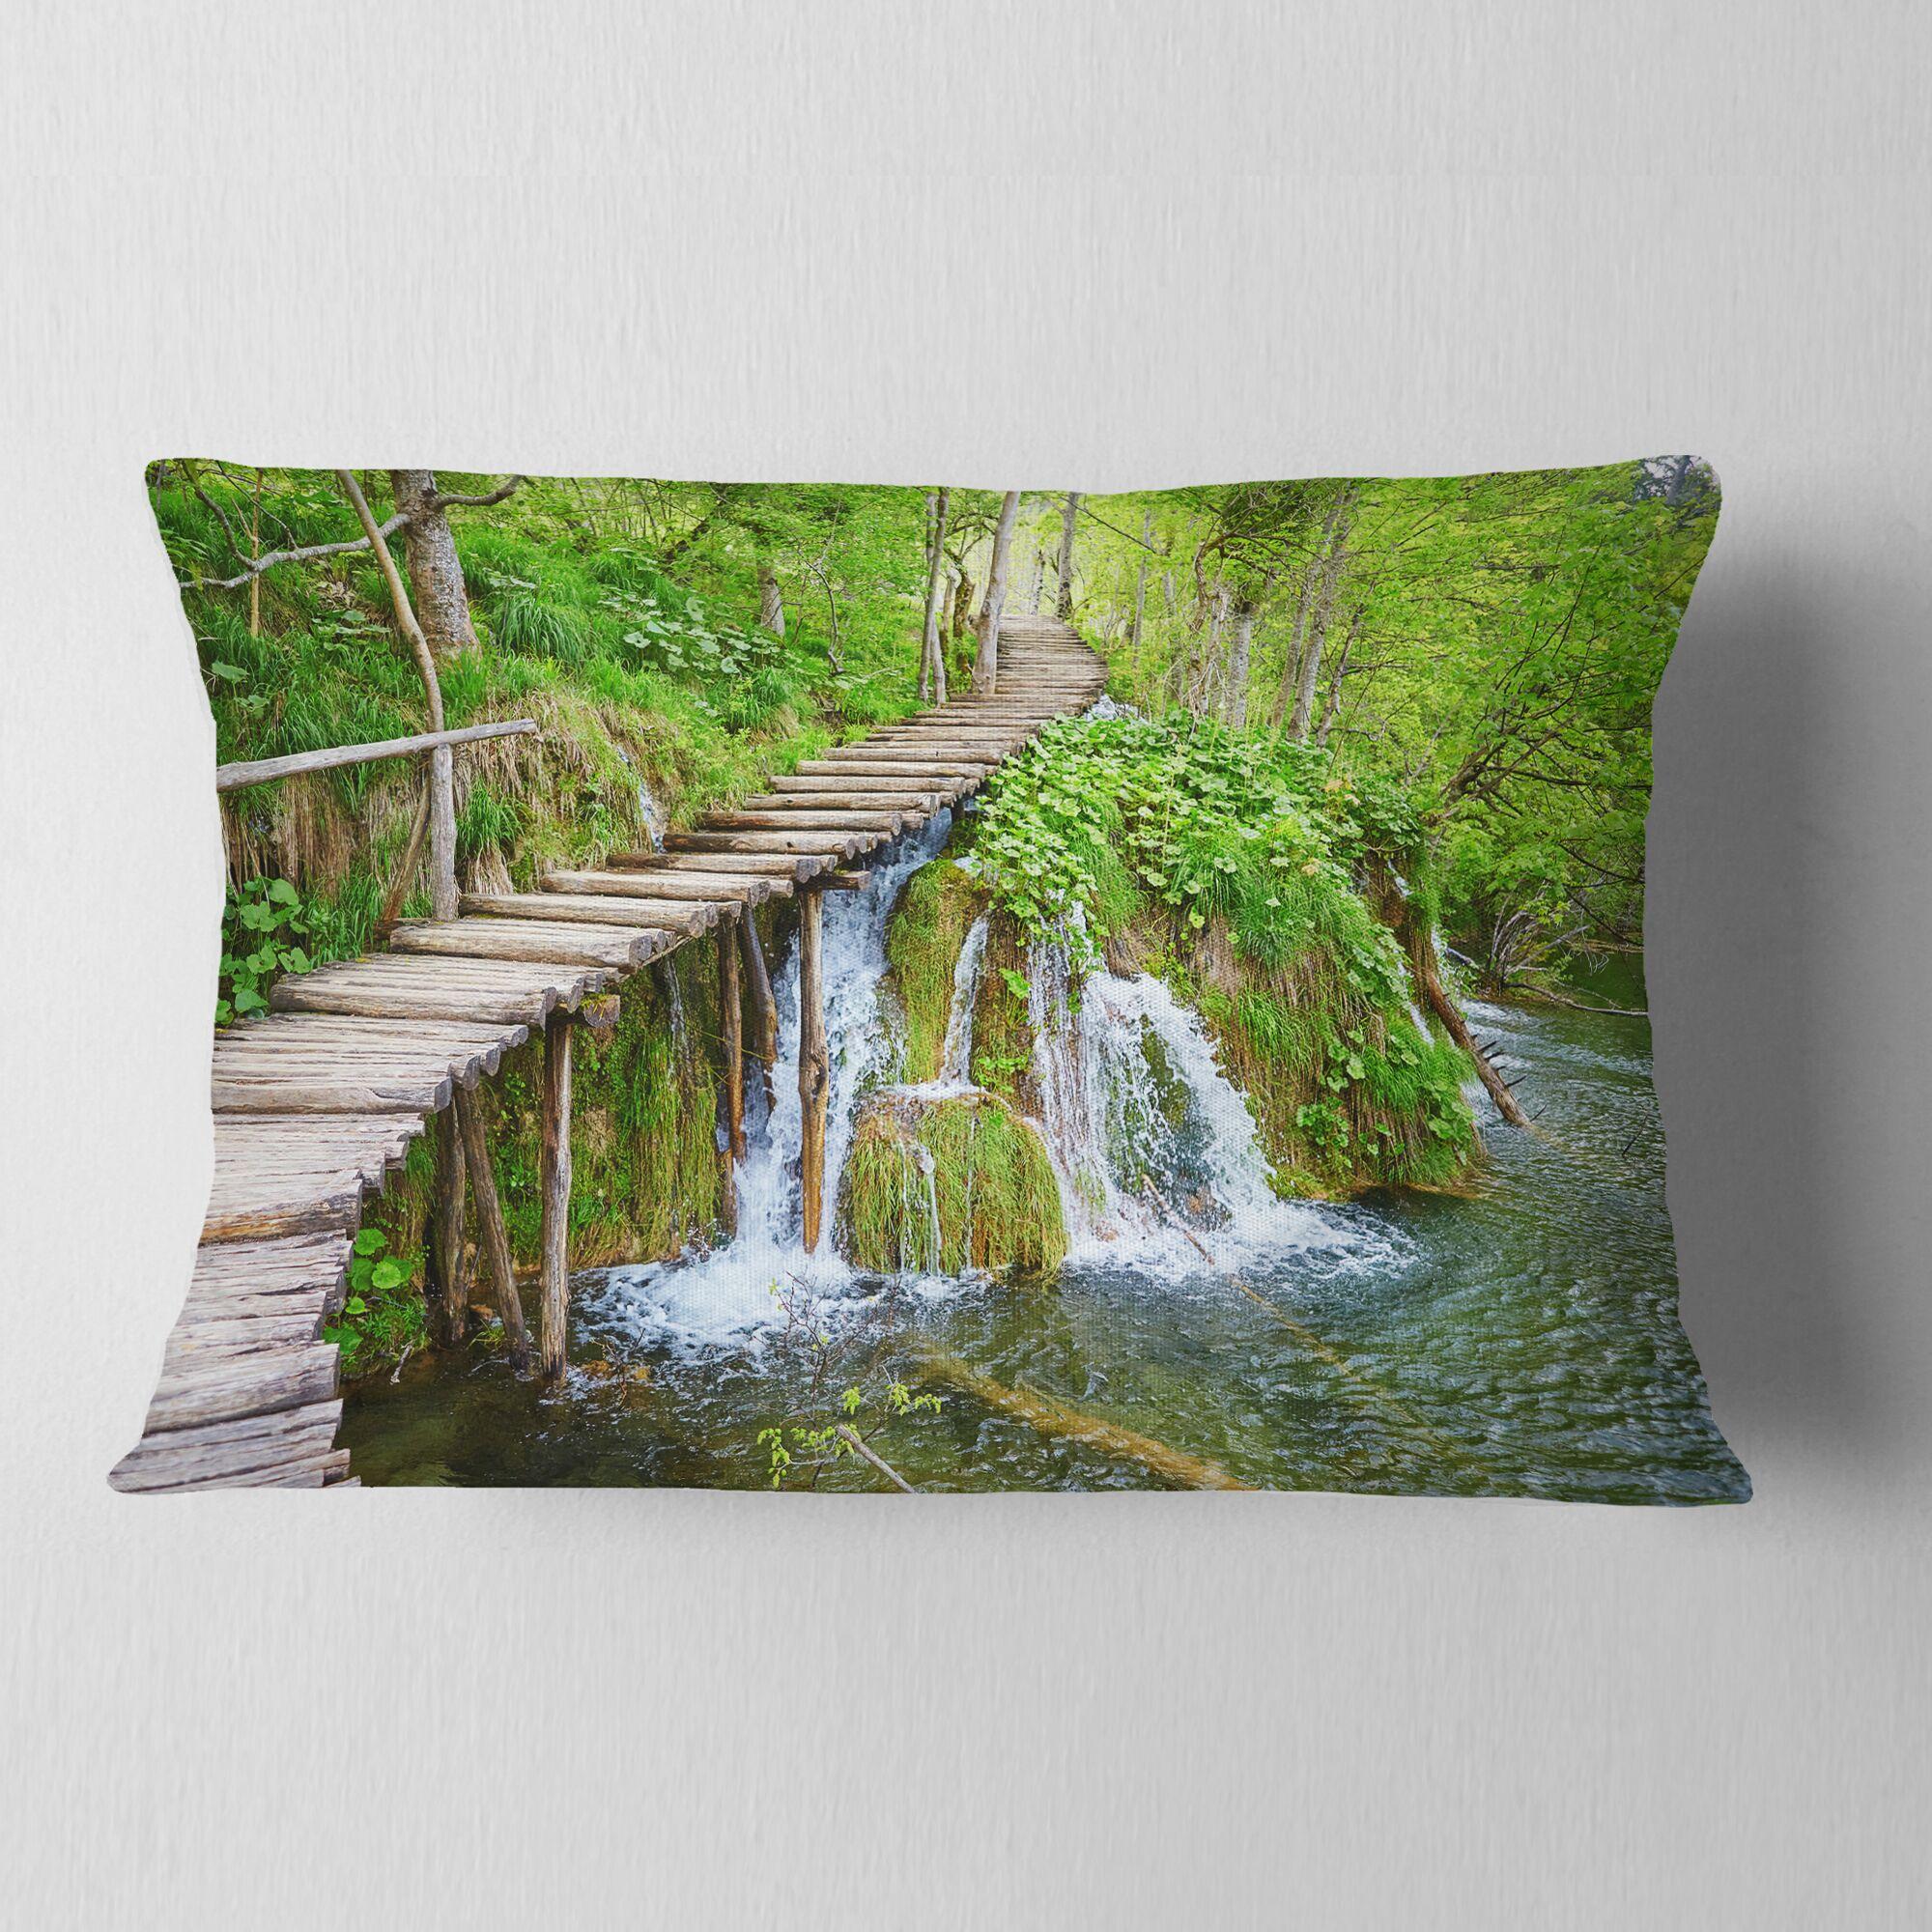 Designart 'Cascades in Plitvice Lakes' Landscape Photography Throw Pillow